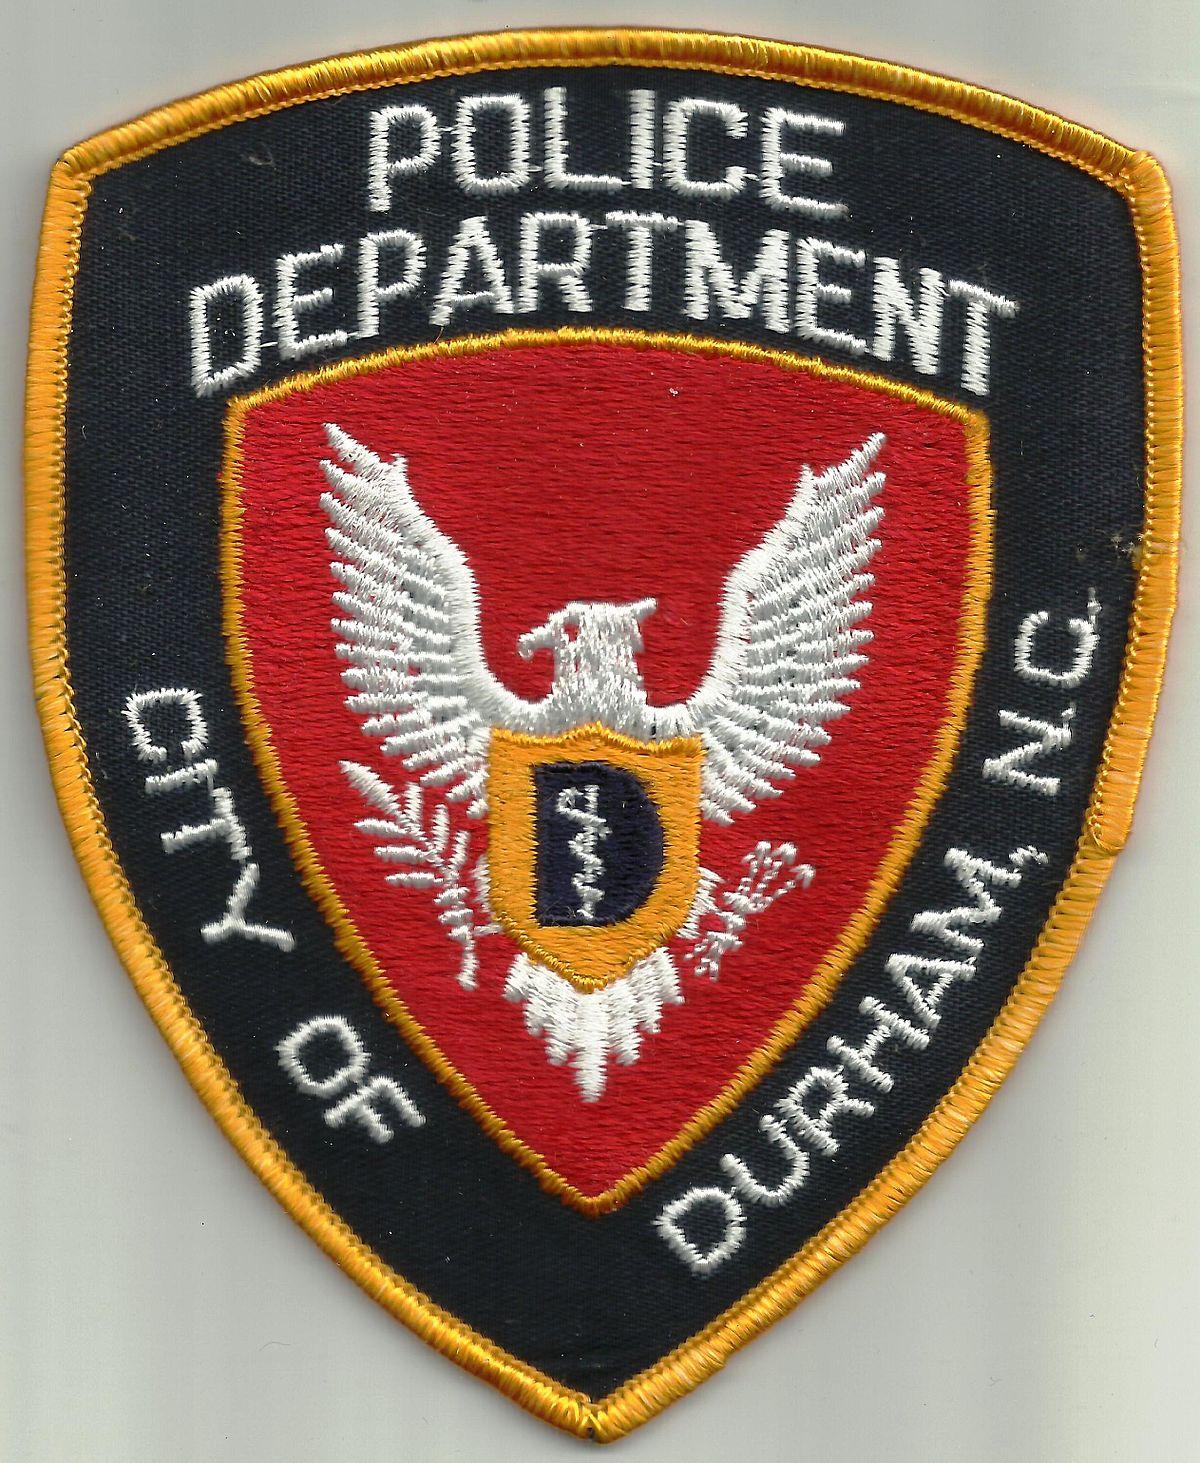 durham police department north carolina wikipedia. Black Bedroom Furniture Sets. Home Design Ideas